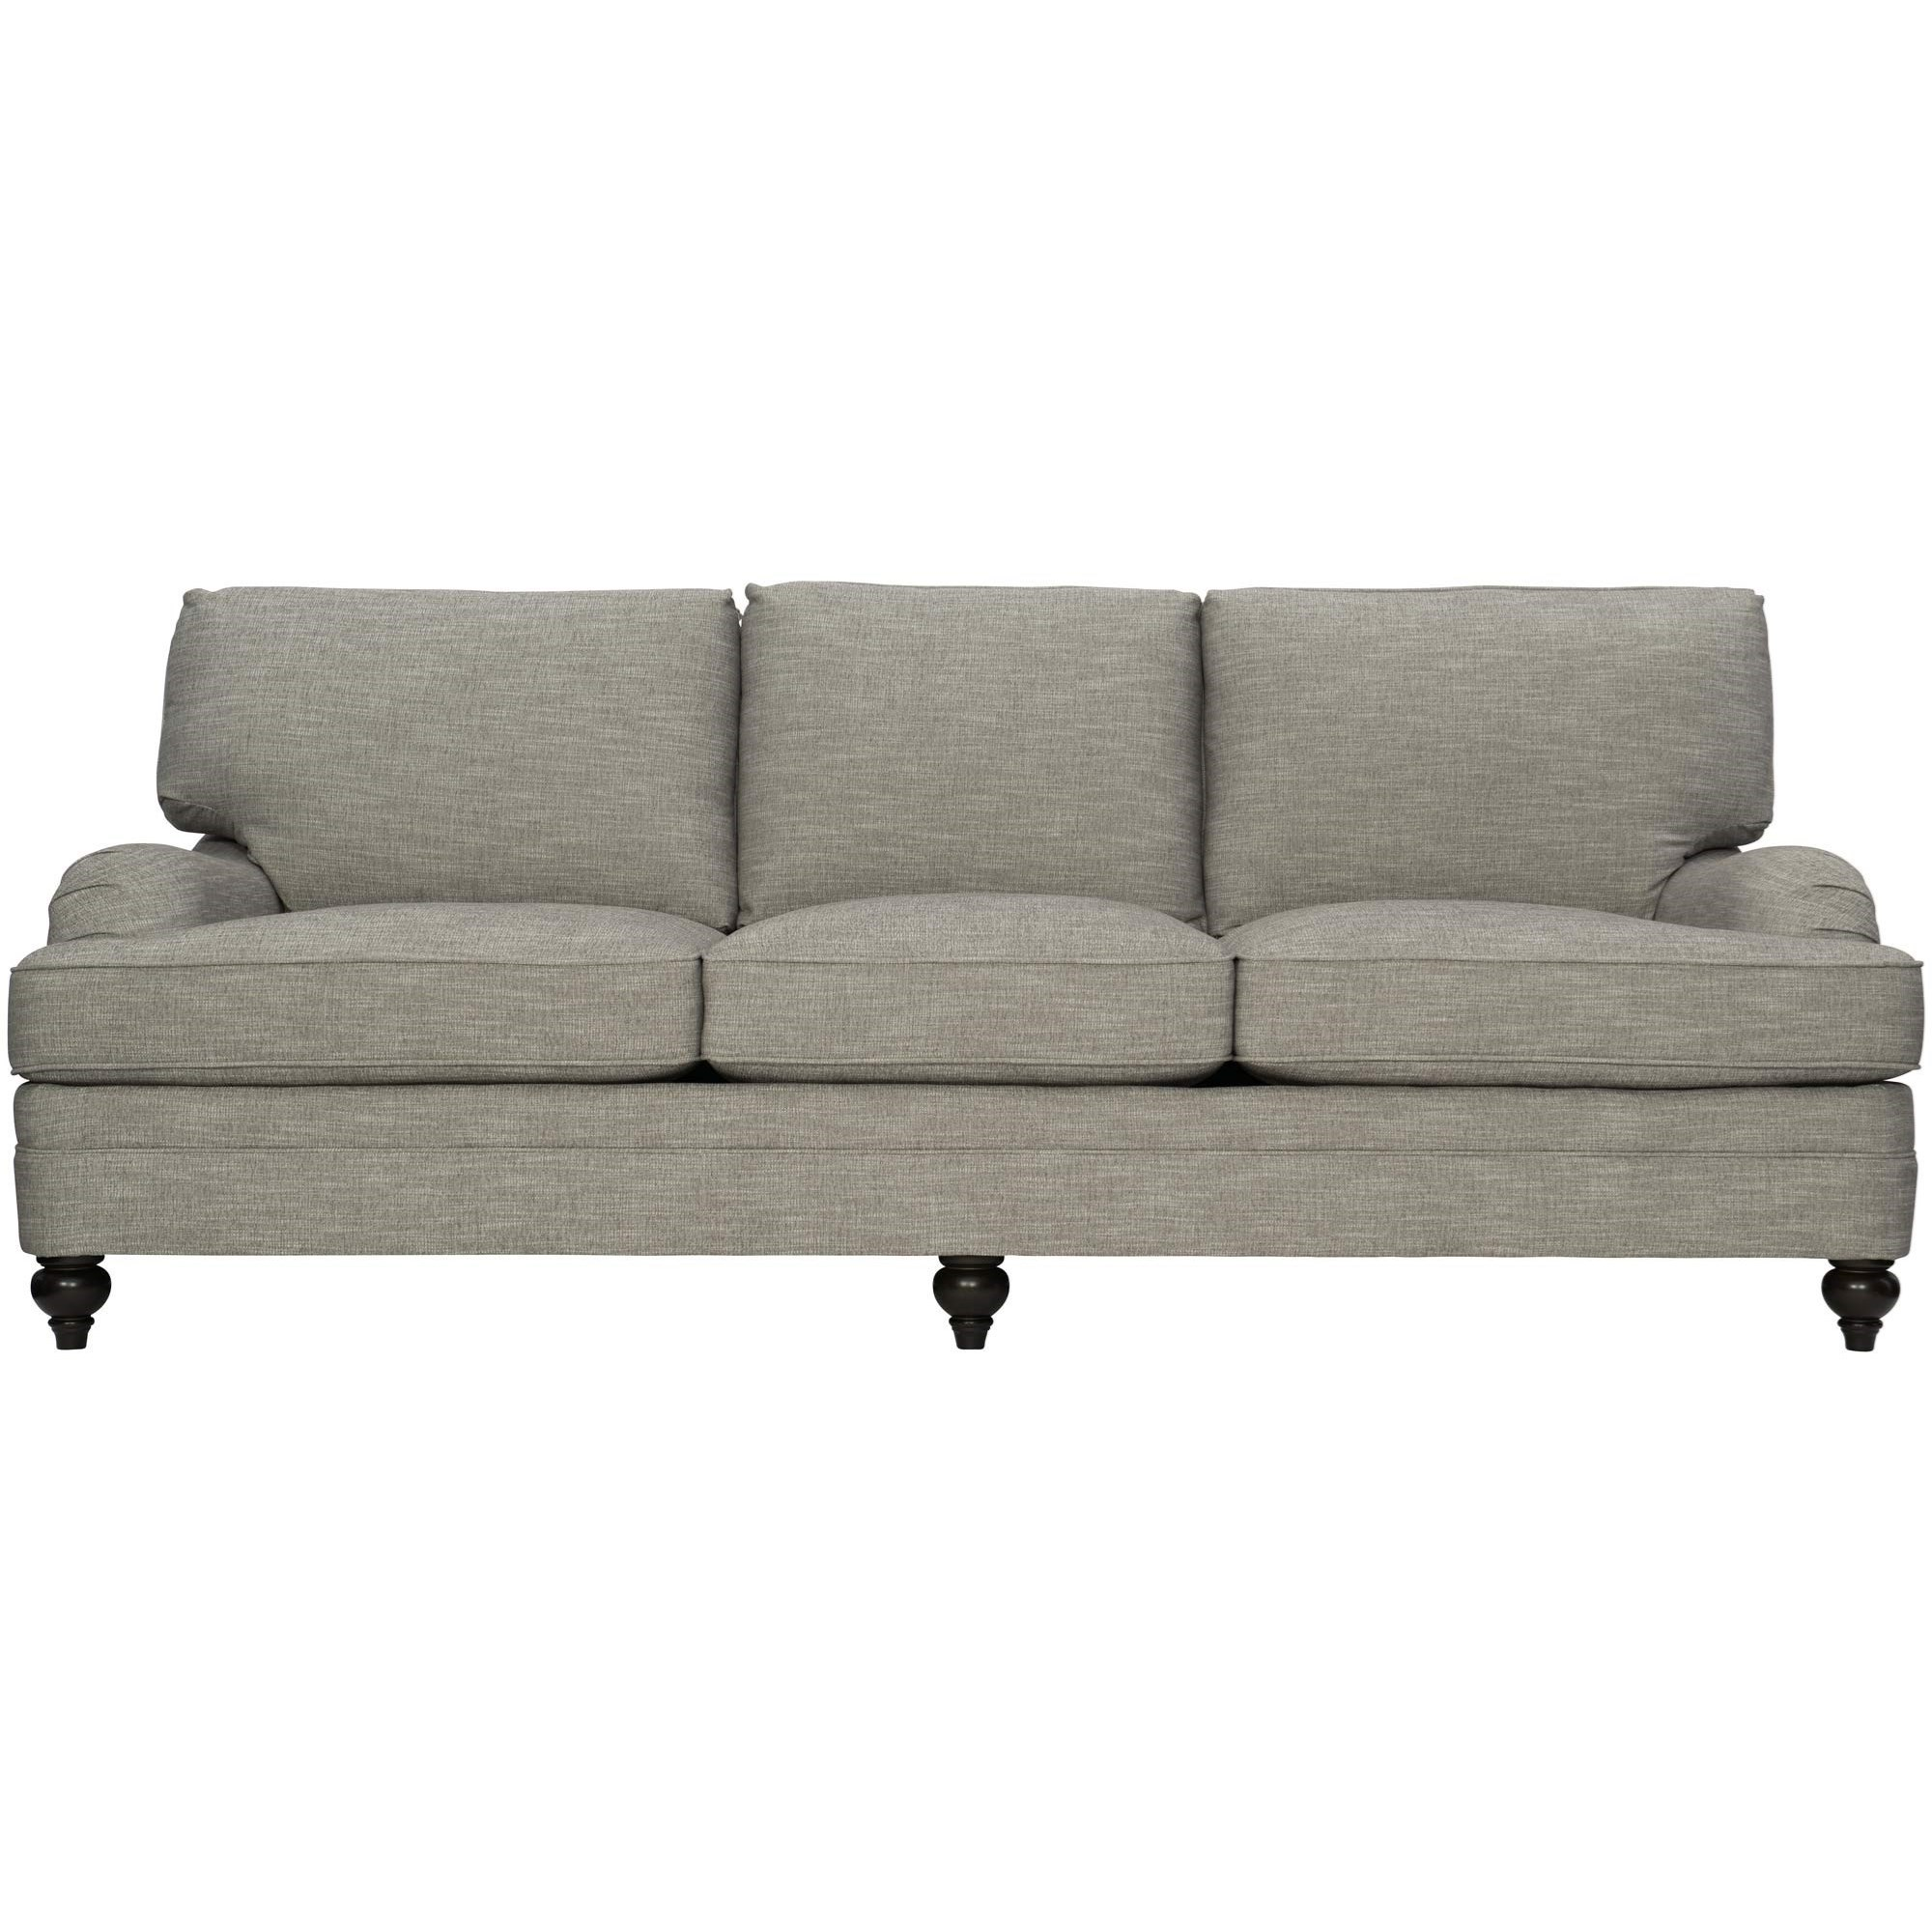 Tarleton Sofa by Bernhardt at Fisher Home Furnishings